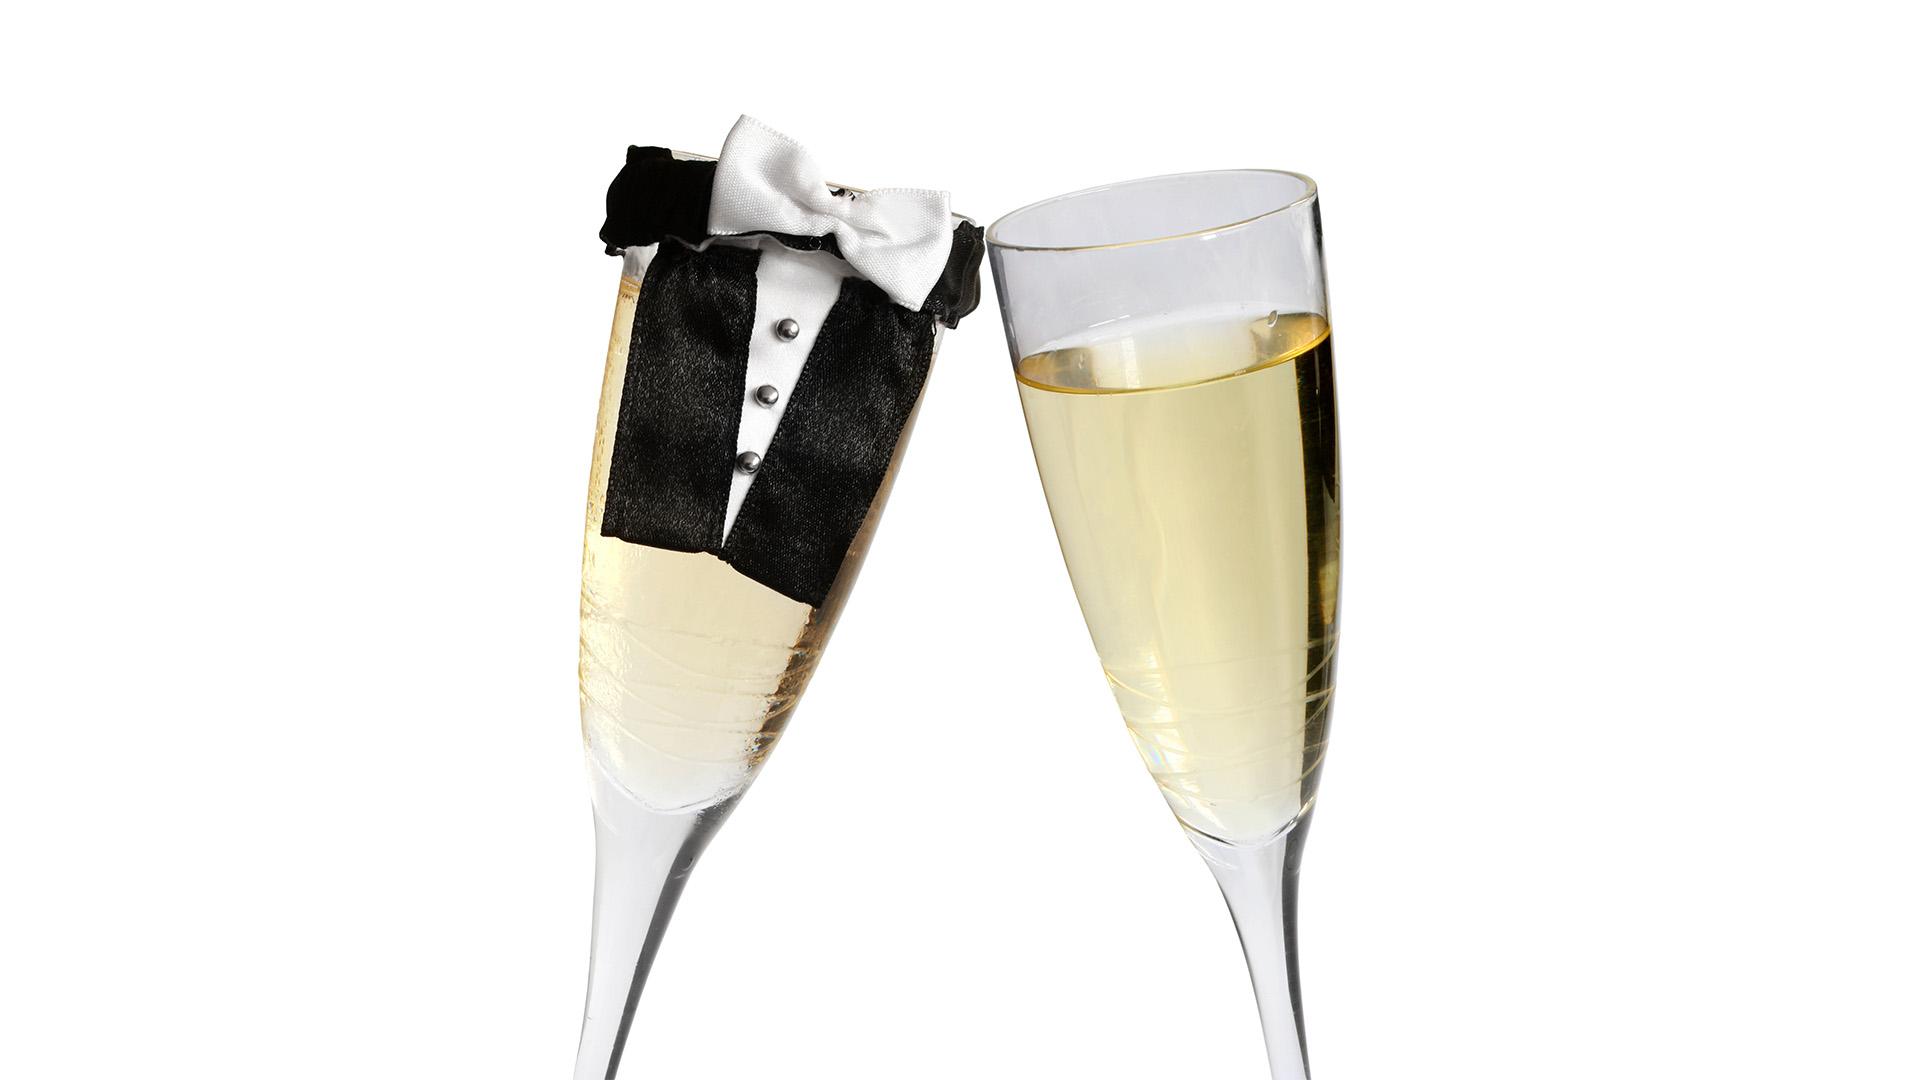 Wedding Venues in Hampshire Mercure Southampton Centre Dolphin Hotel Honeymoon Suite 2